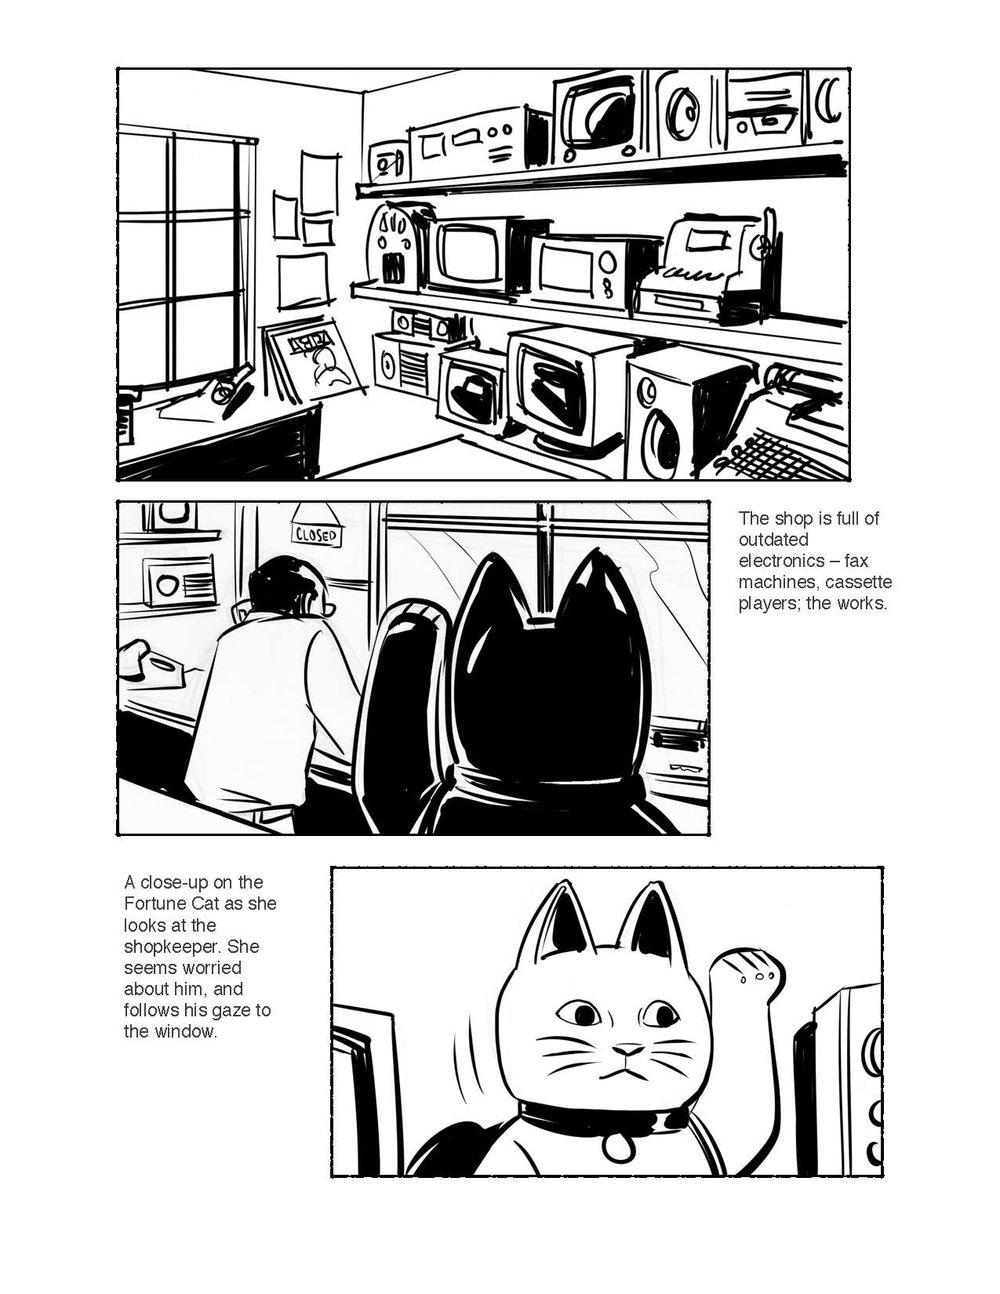 Storyboard HKTDC_Page_02.jpg